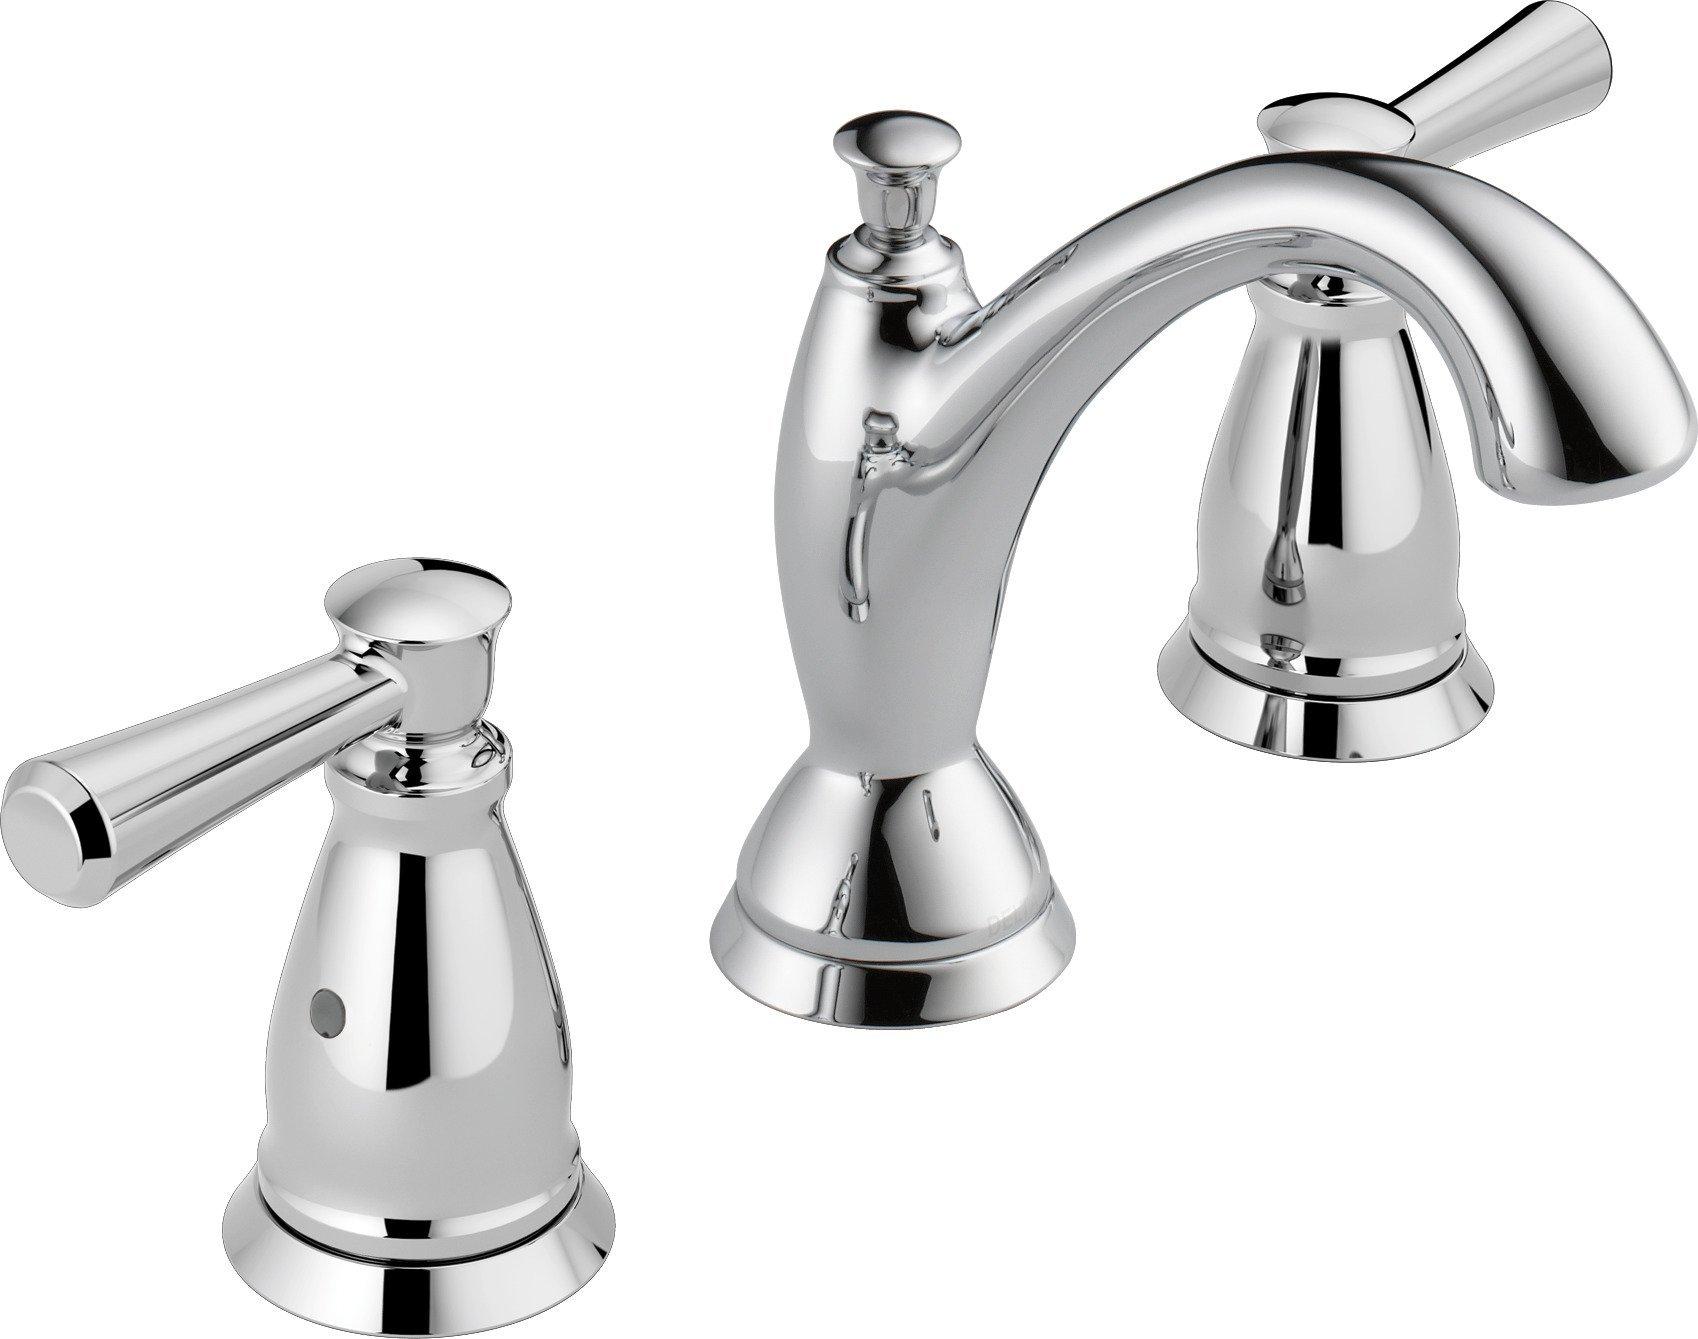 Delta Faucet 3593-MPU-DST Two Handle Widespread Bathroom Faucet, Chrome,